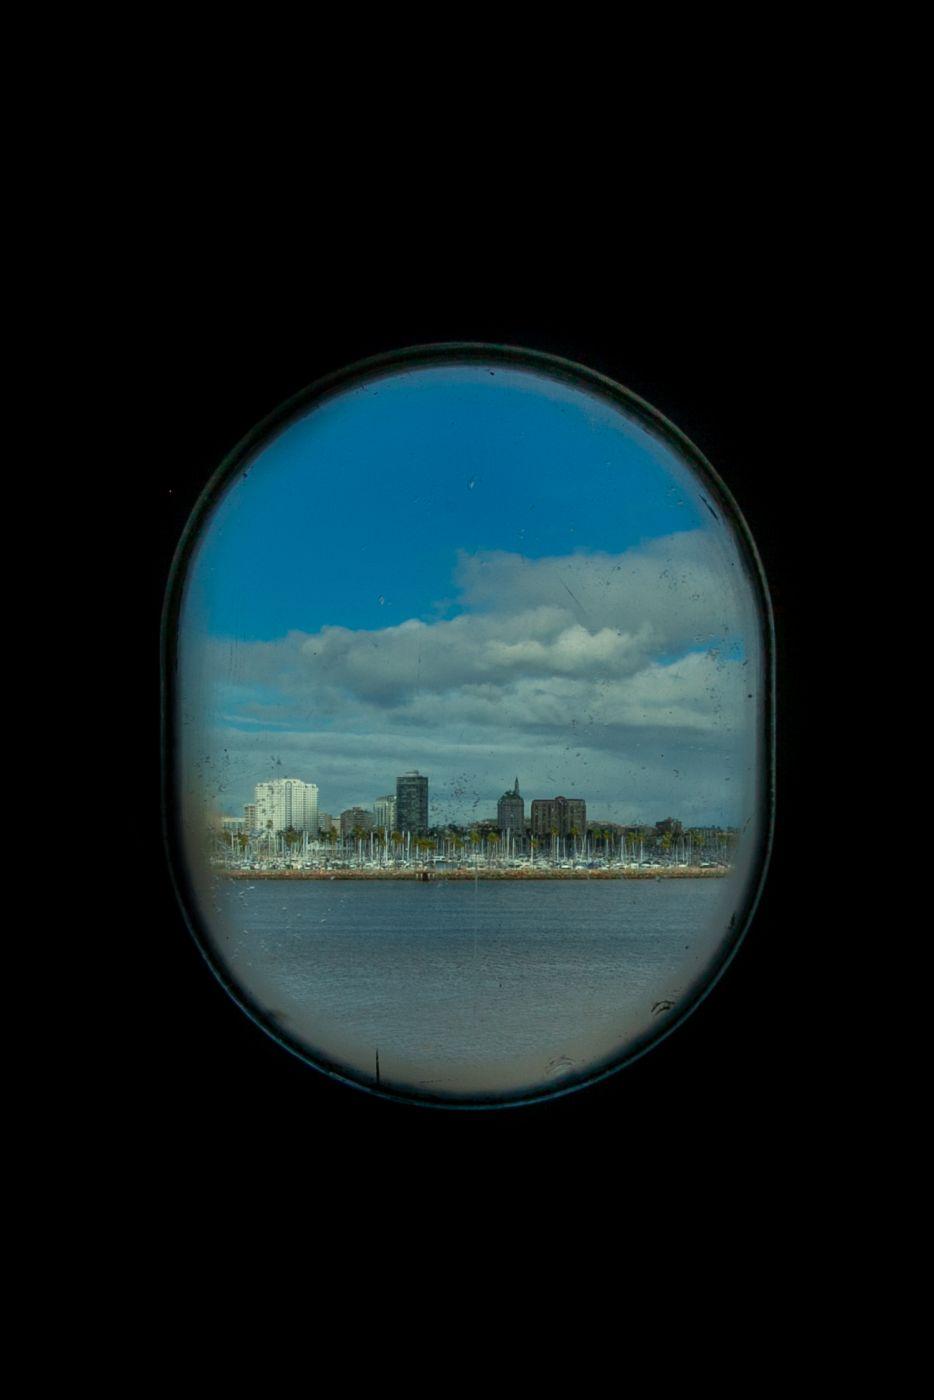 Porthole, Queen Mary, Long Beach, USA